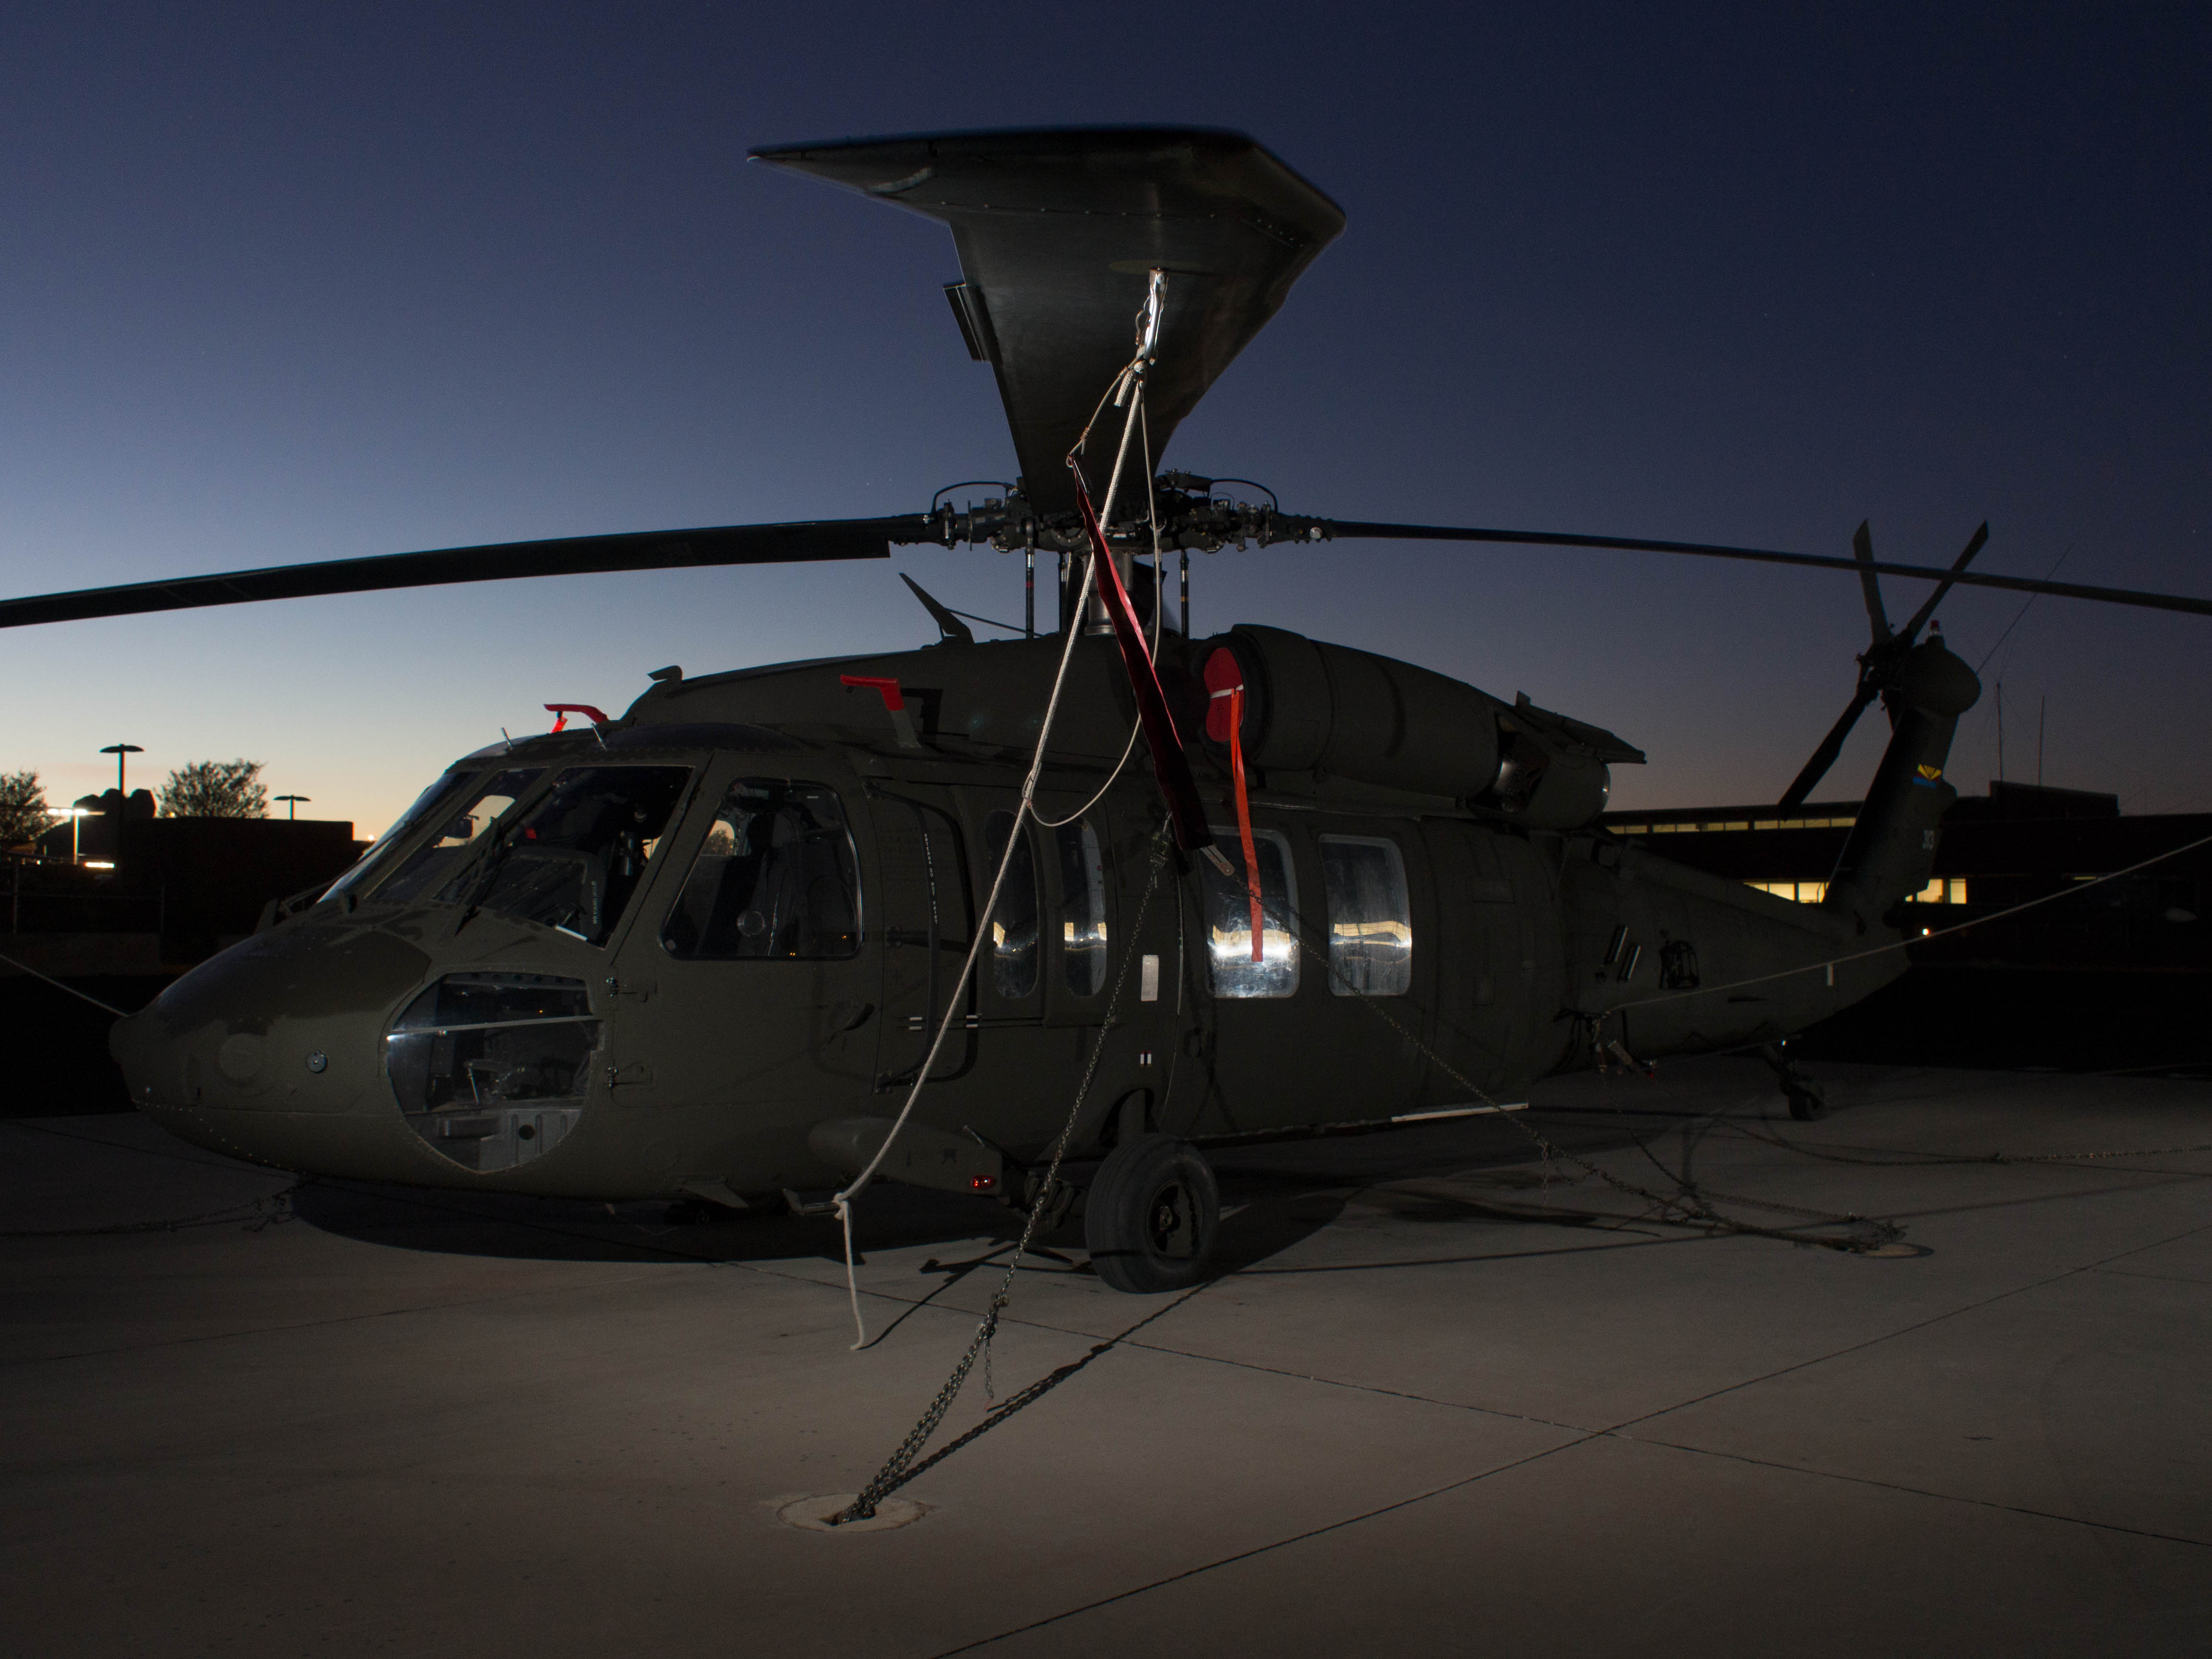 National Guard UH-60A